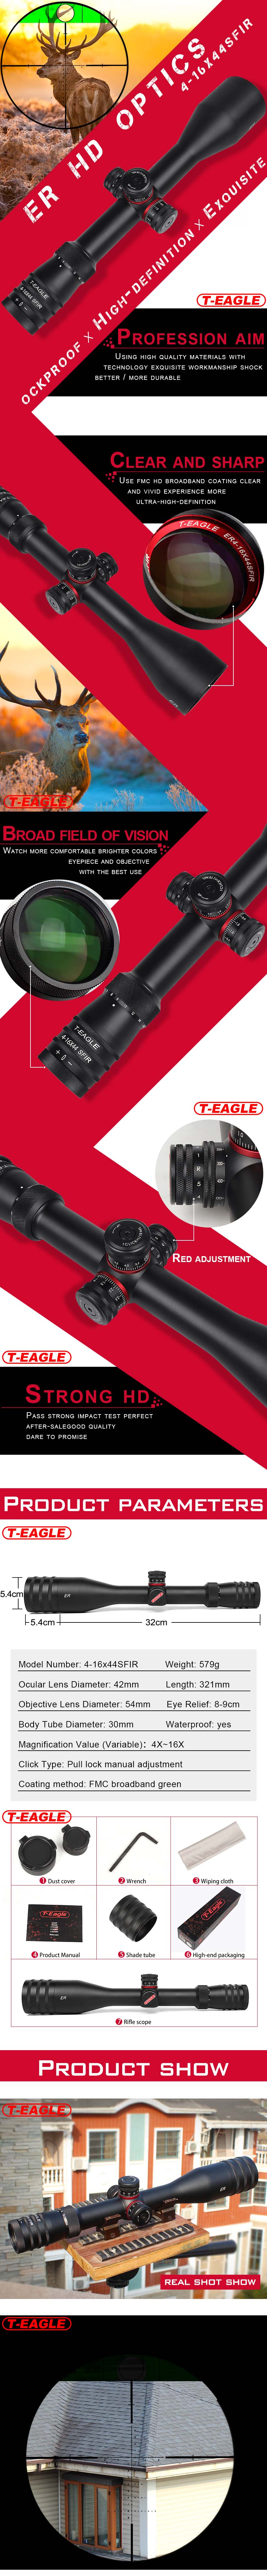 Tactical Long Range Scopes T-EAGLE ER 4-16x44 Shooting Optical PIC-2